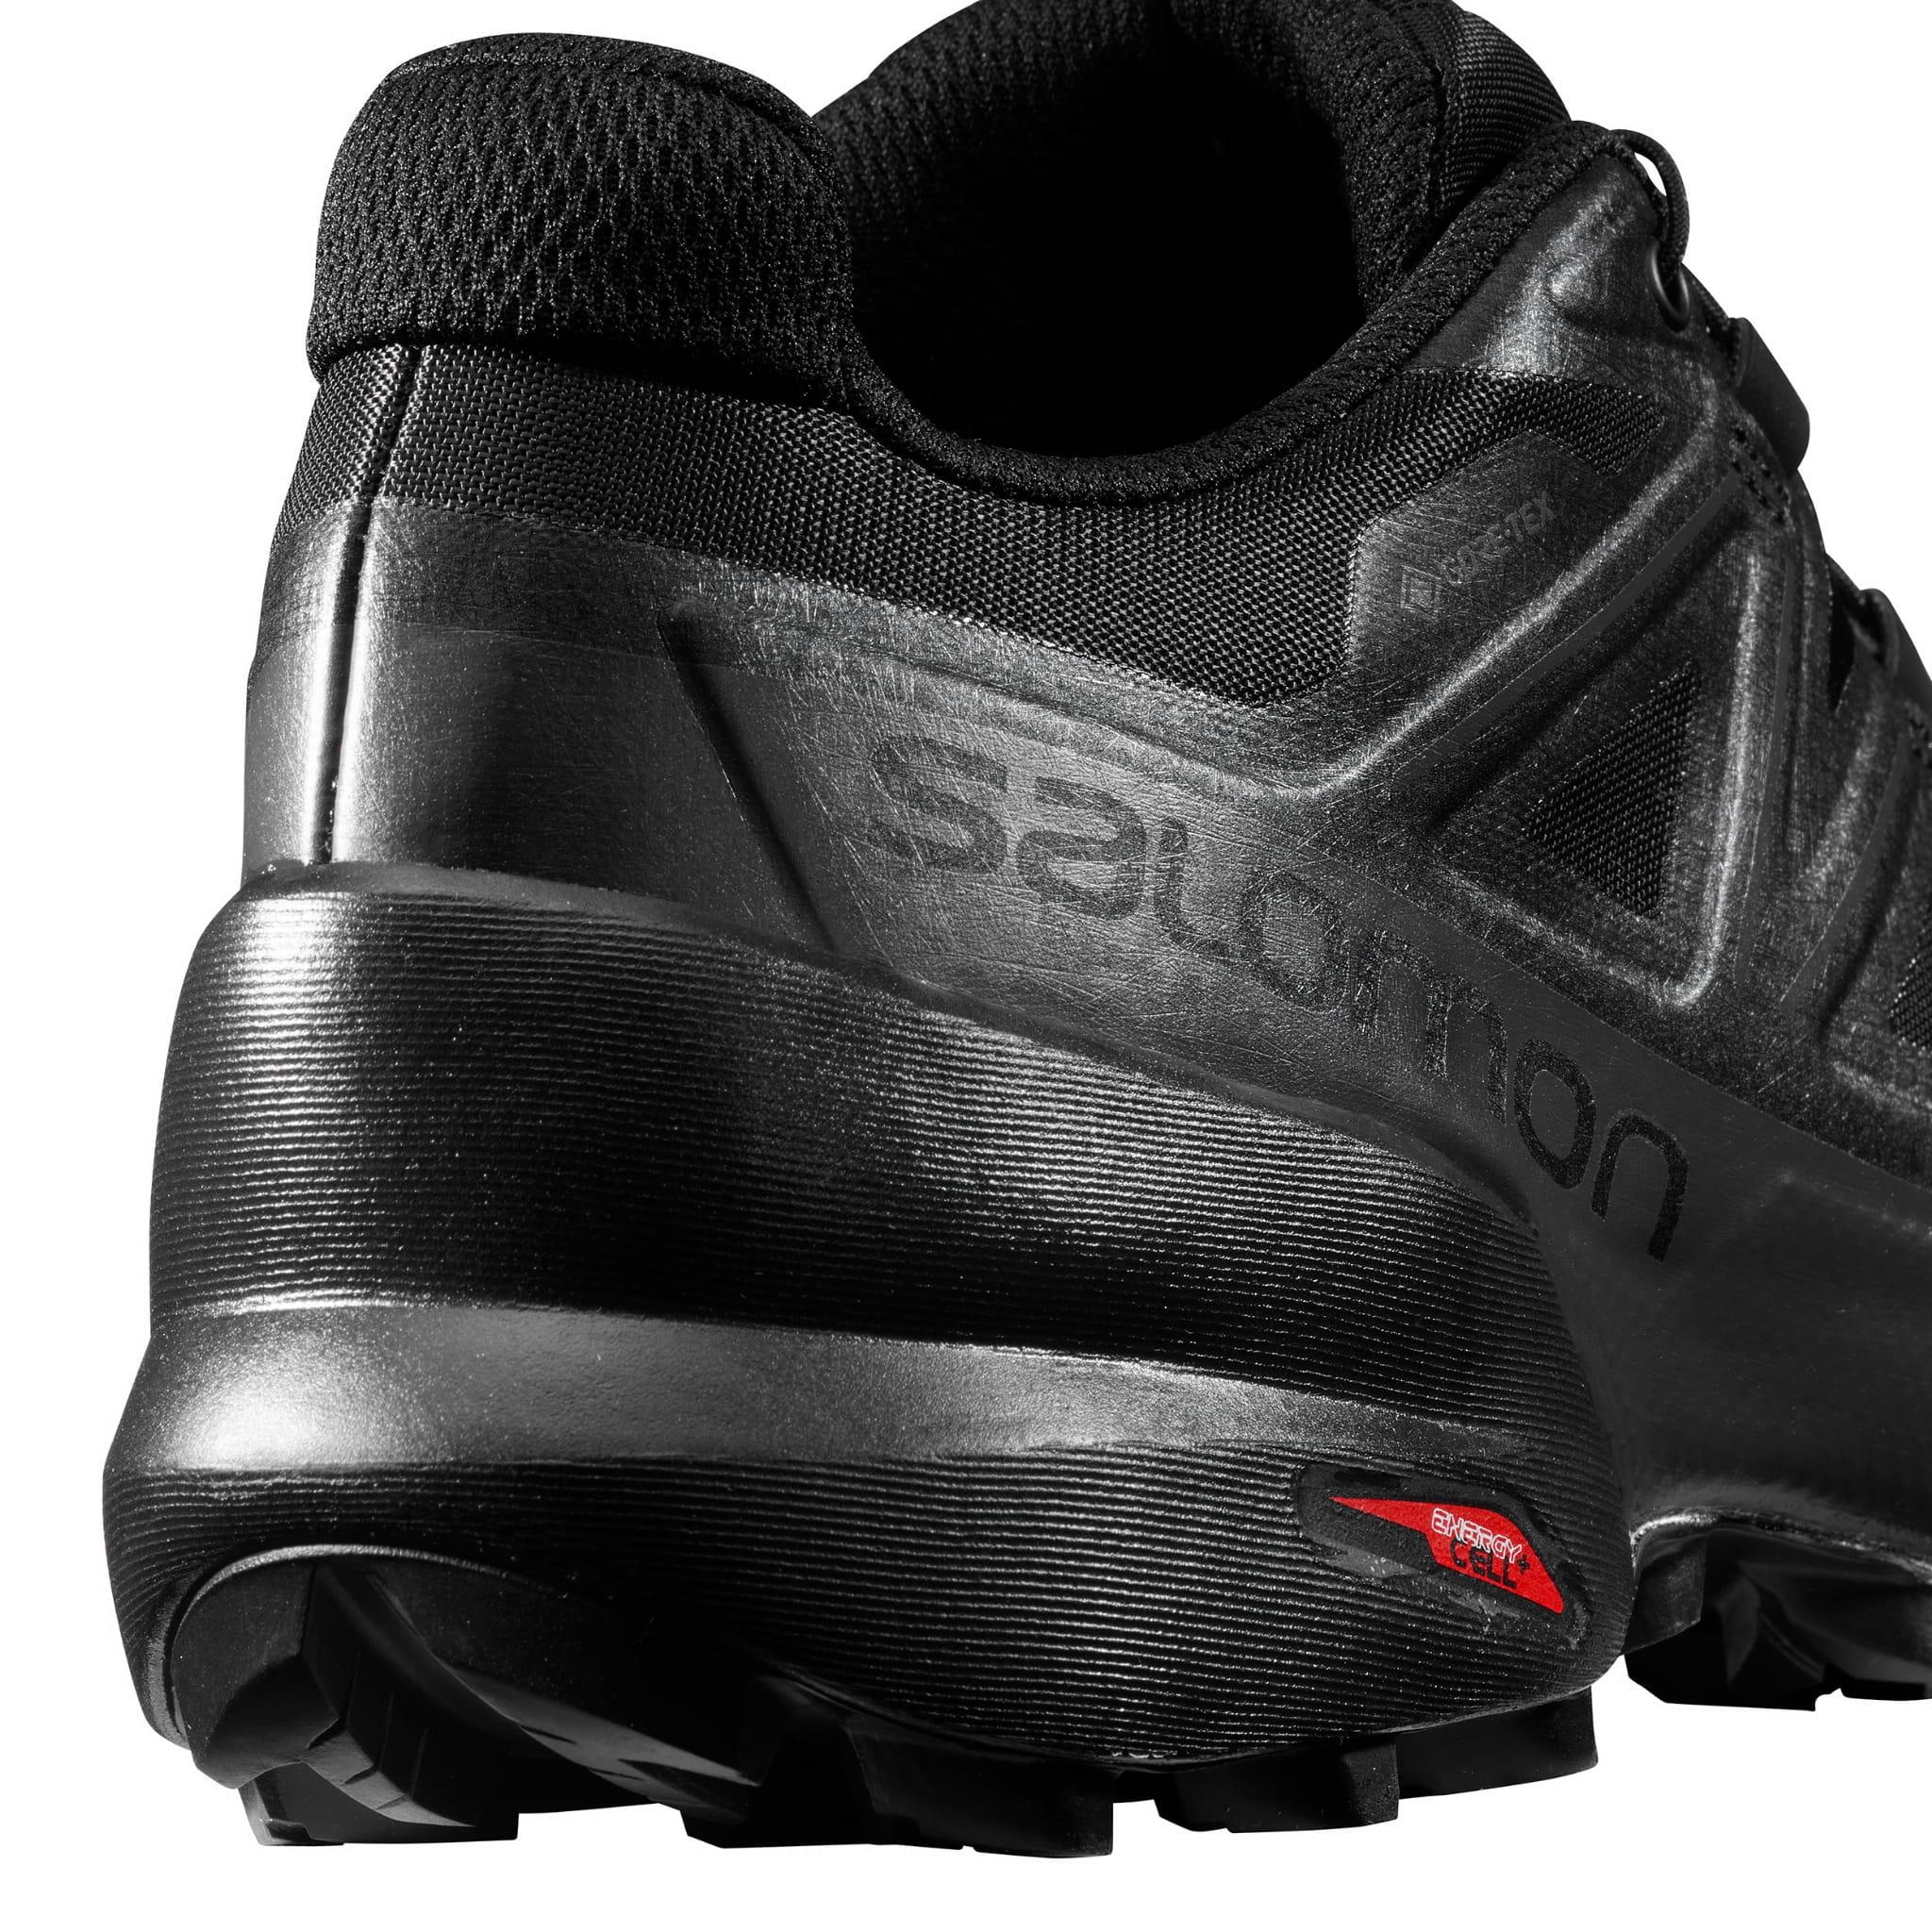 Buty Salomon Speedcross 5 GTX W Black